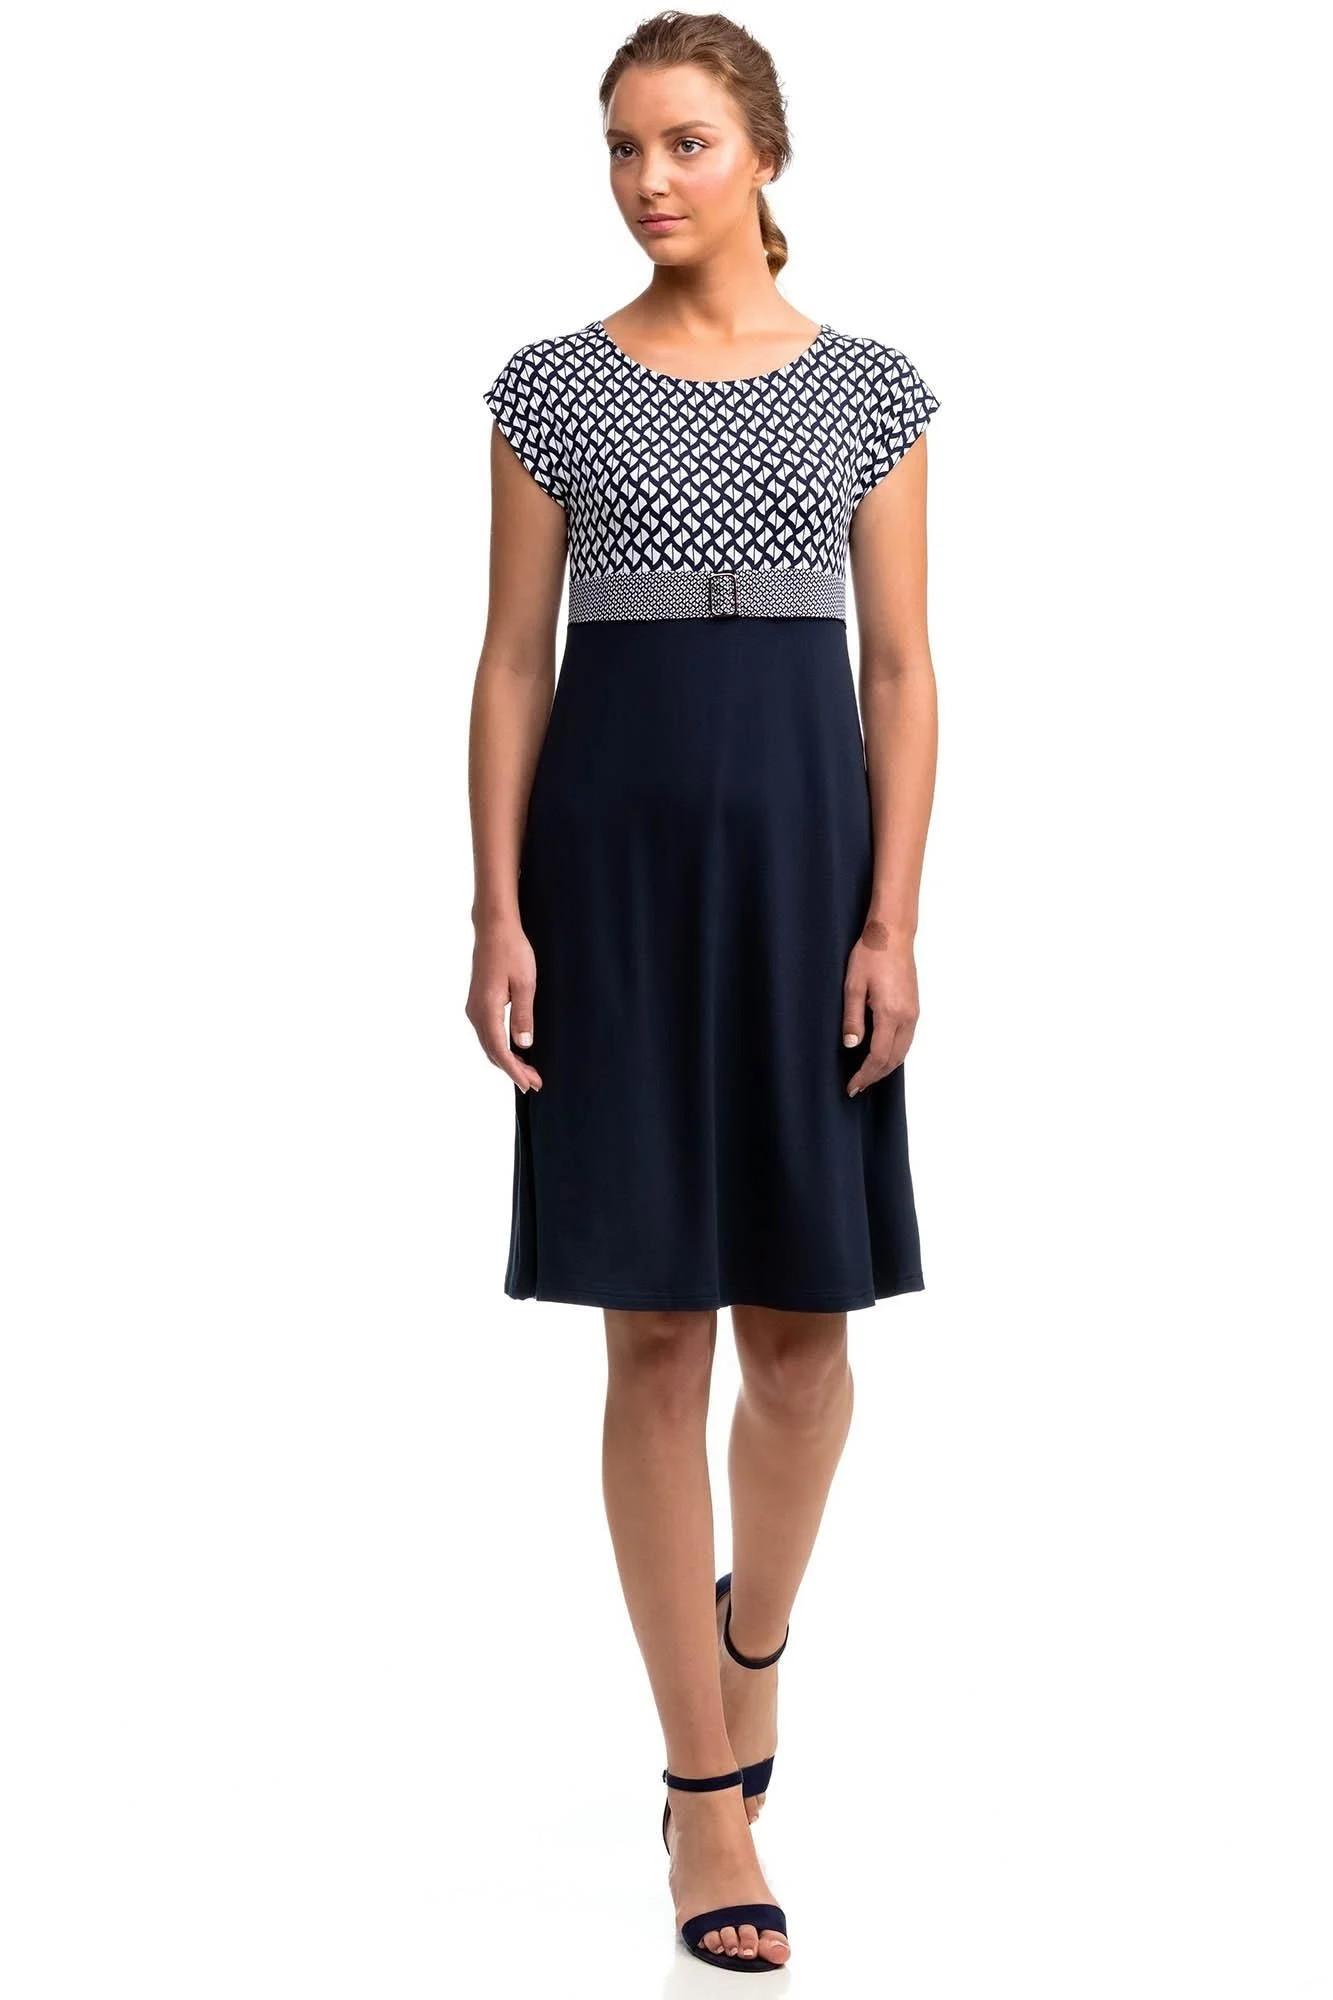 Dámské šaty 14452 - Vamp černo - bílá S